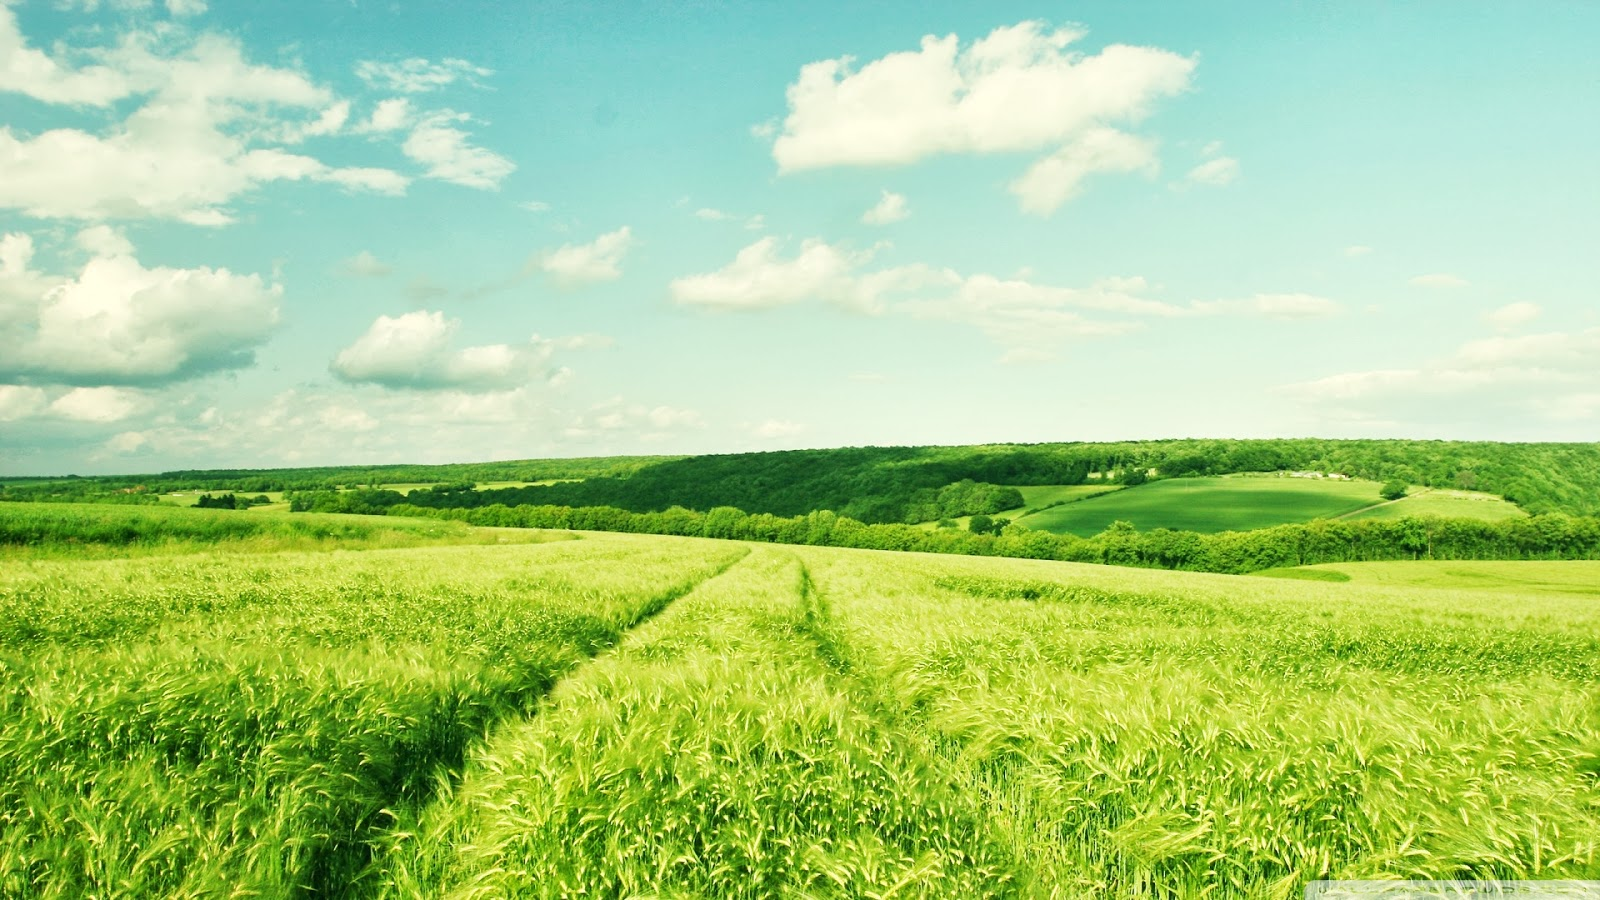 Summer Nature Desktop Background Apps Directories 1600x900